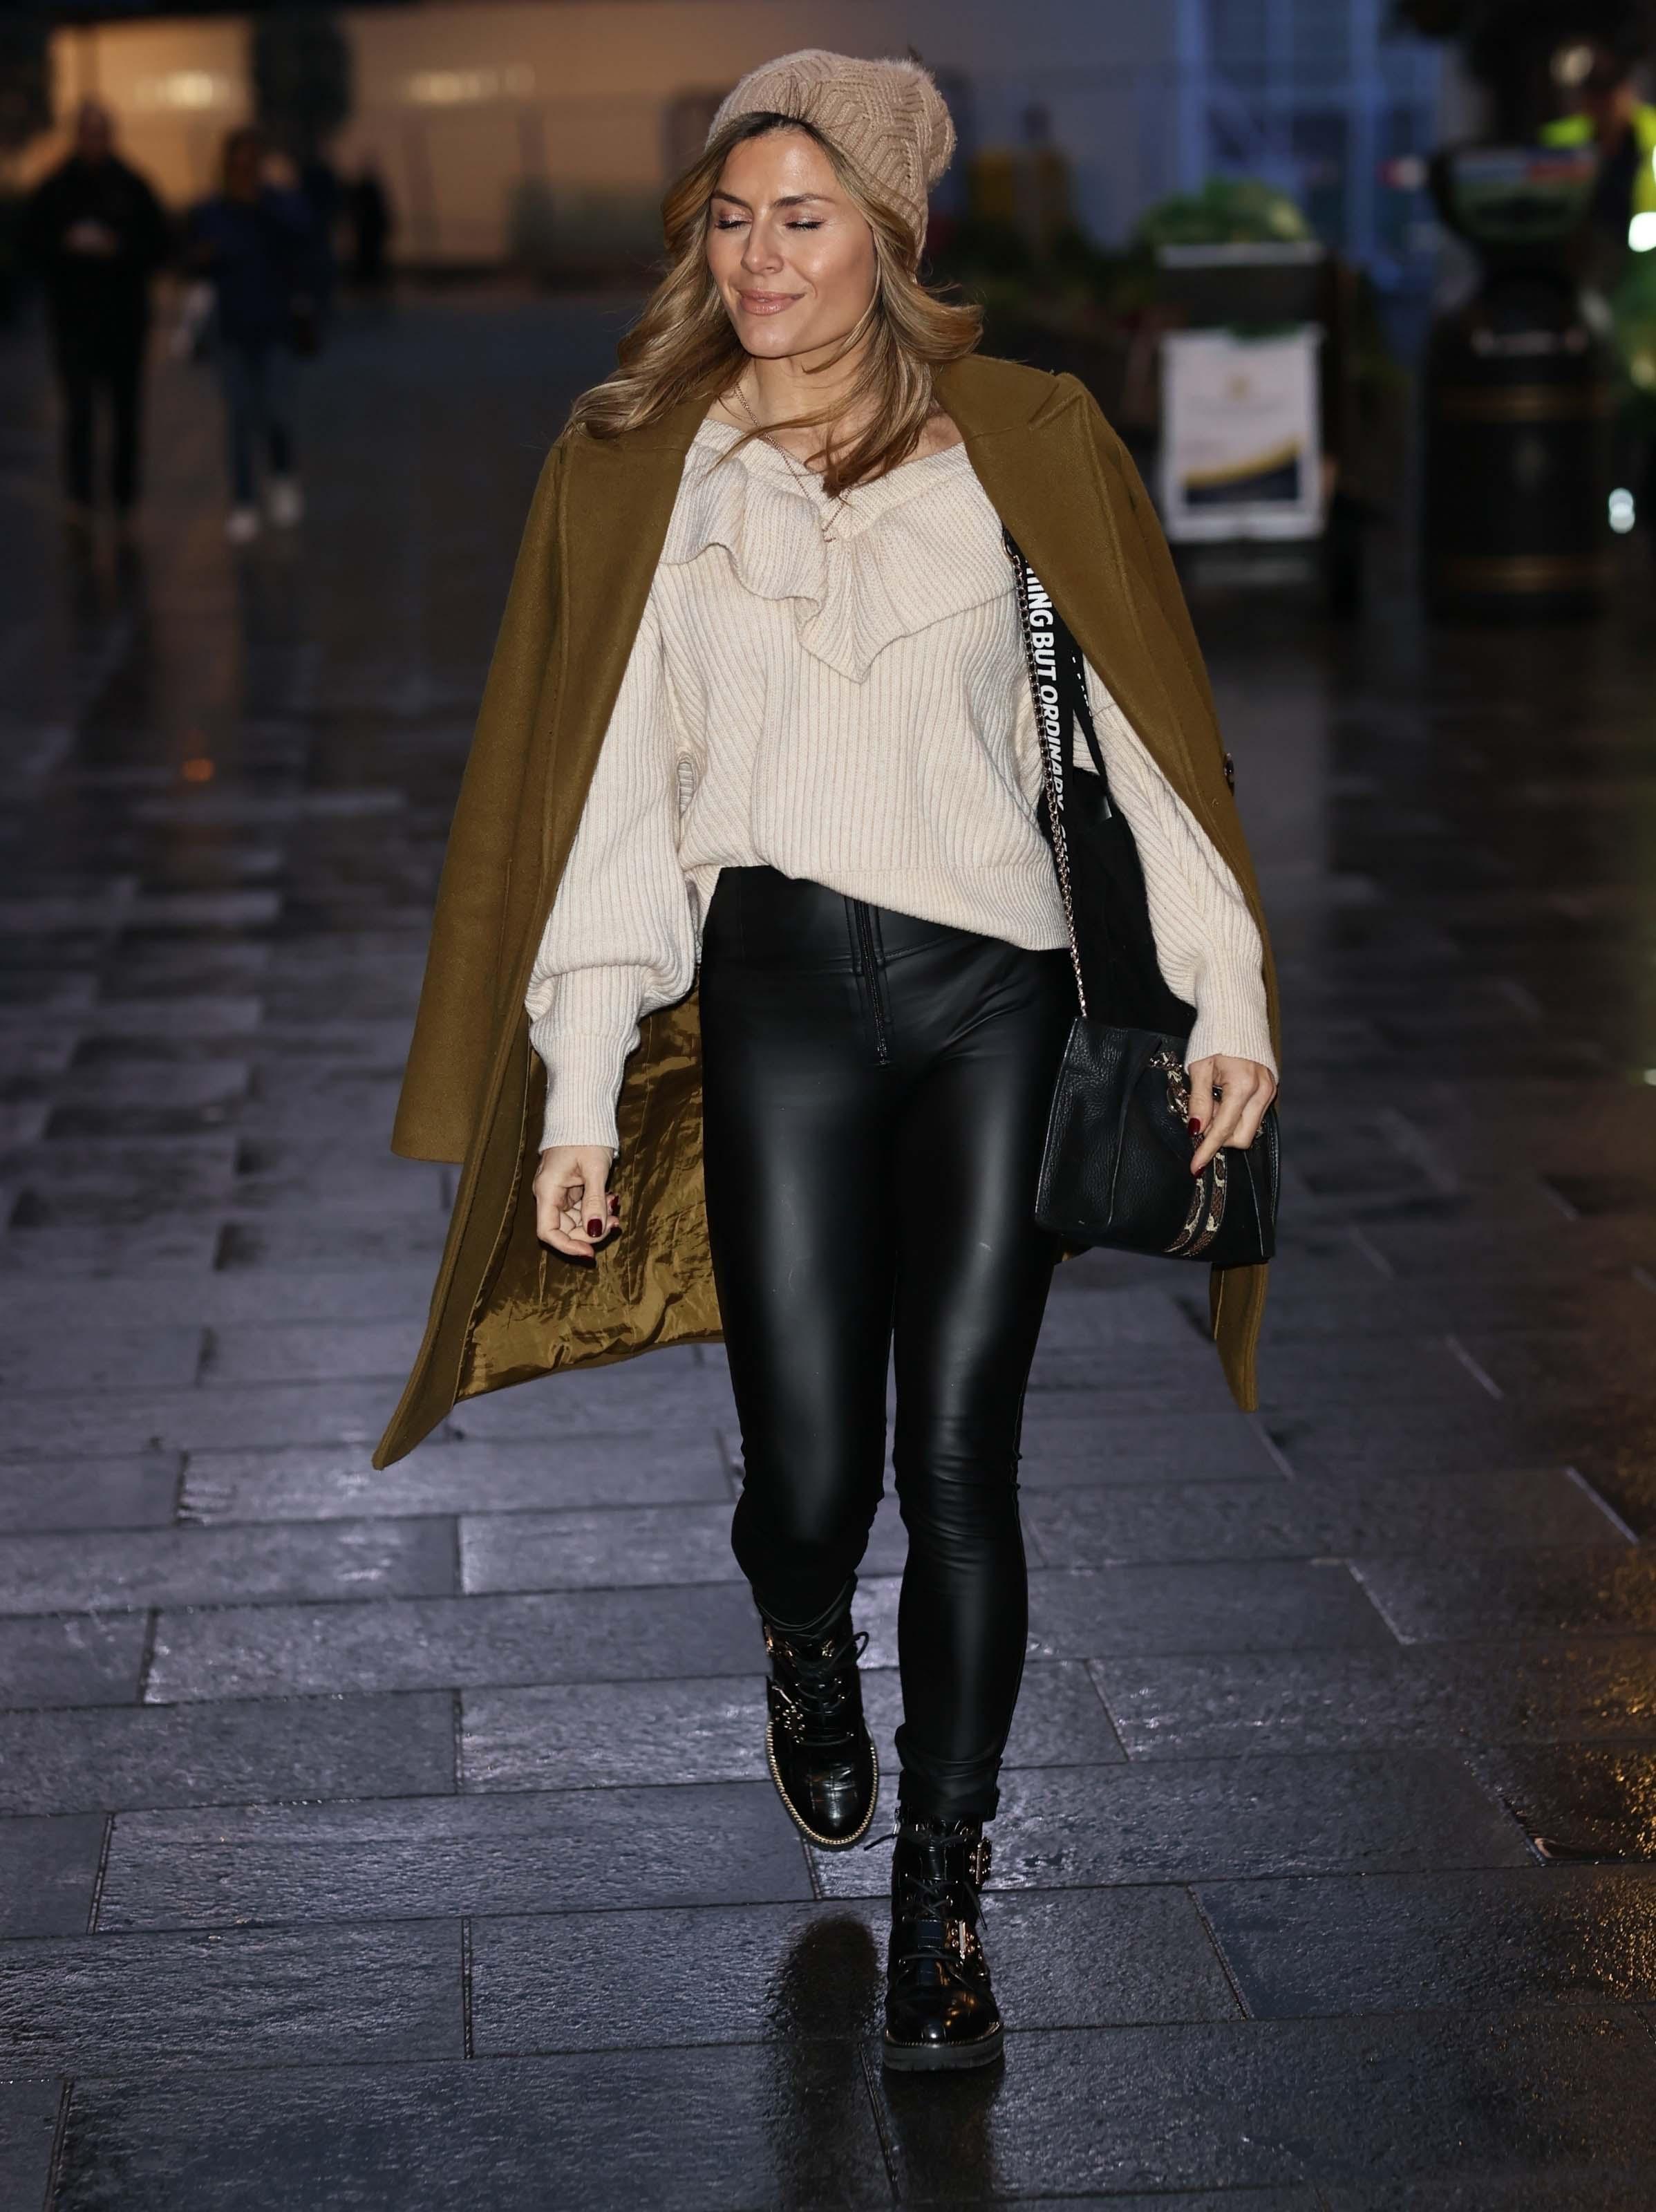 Zoe Hardman seen at Smooth radio in London